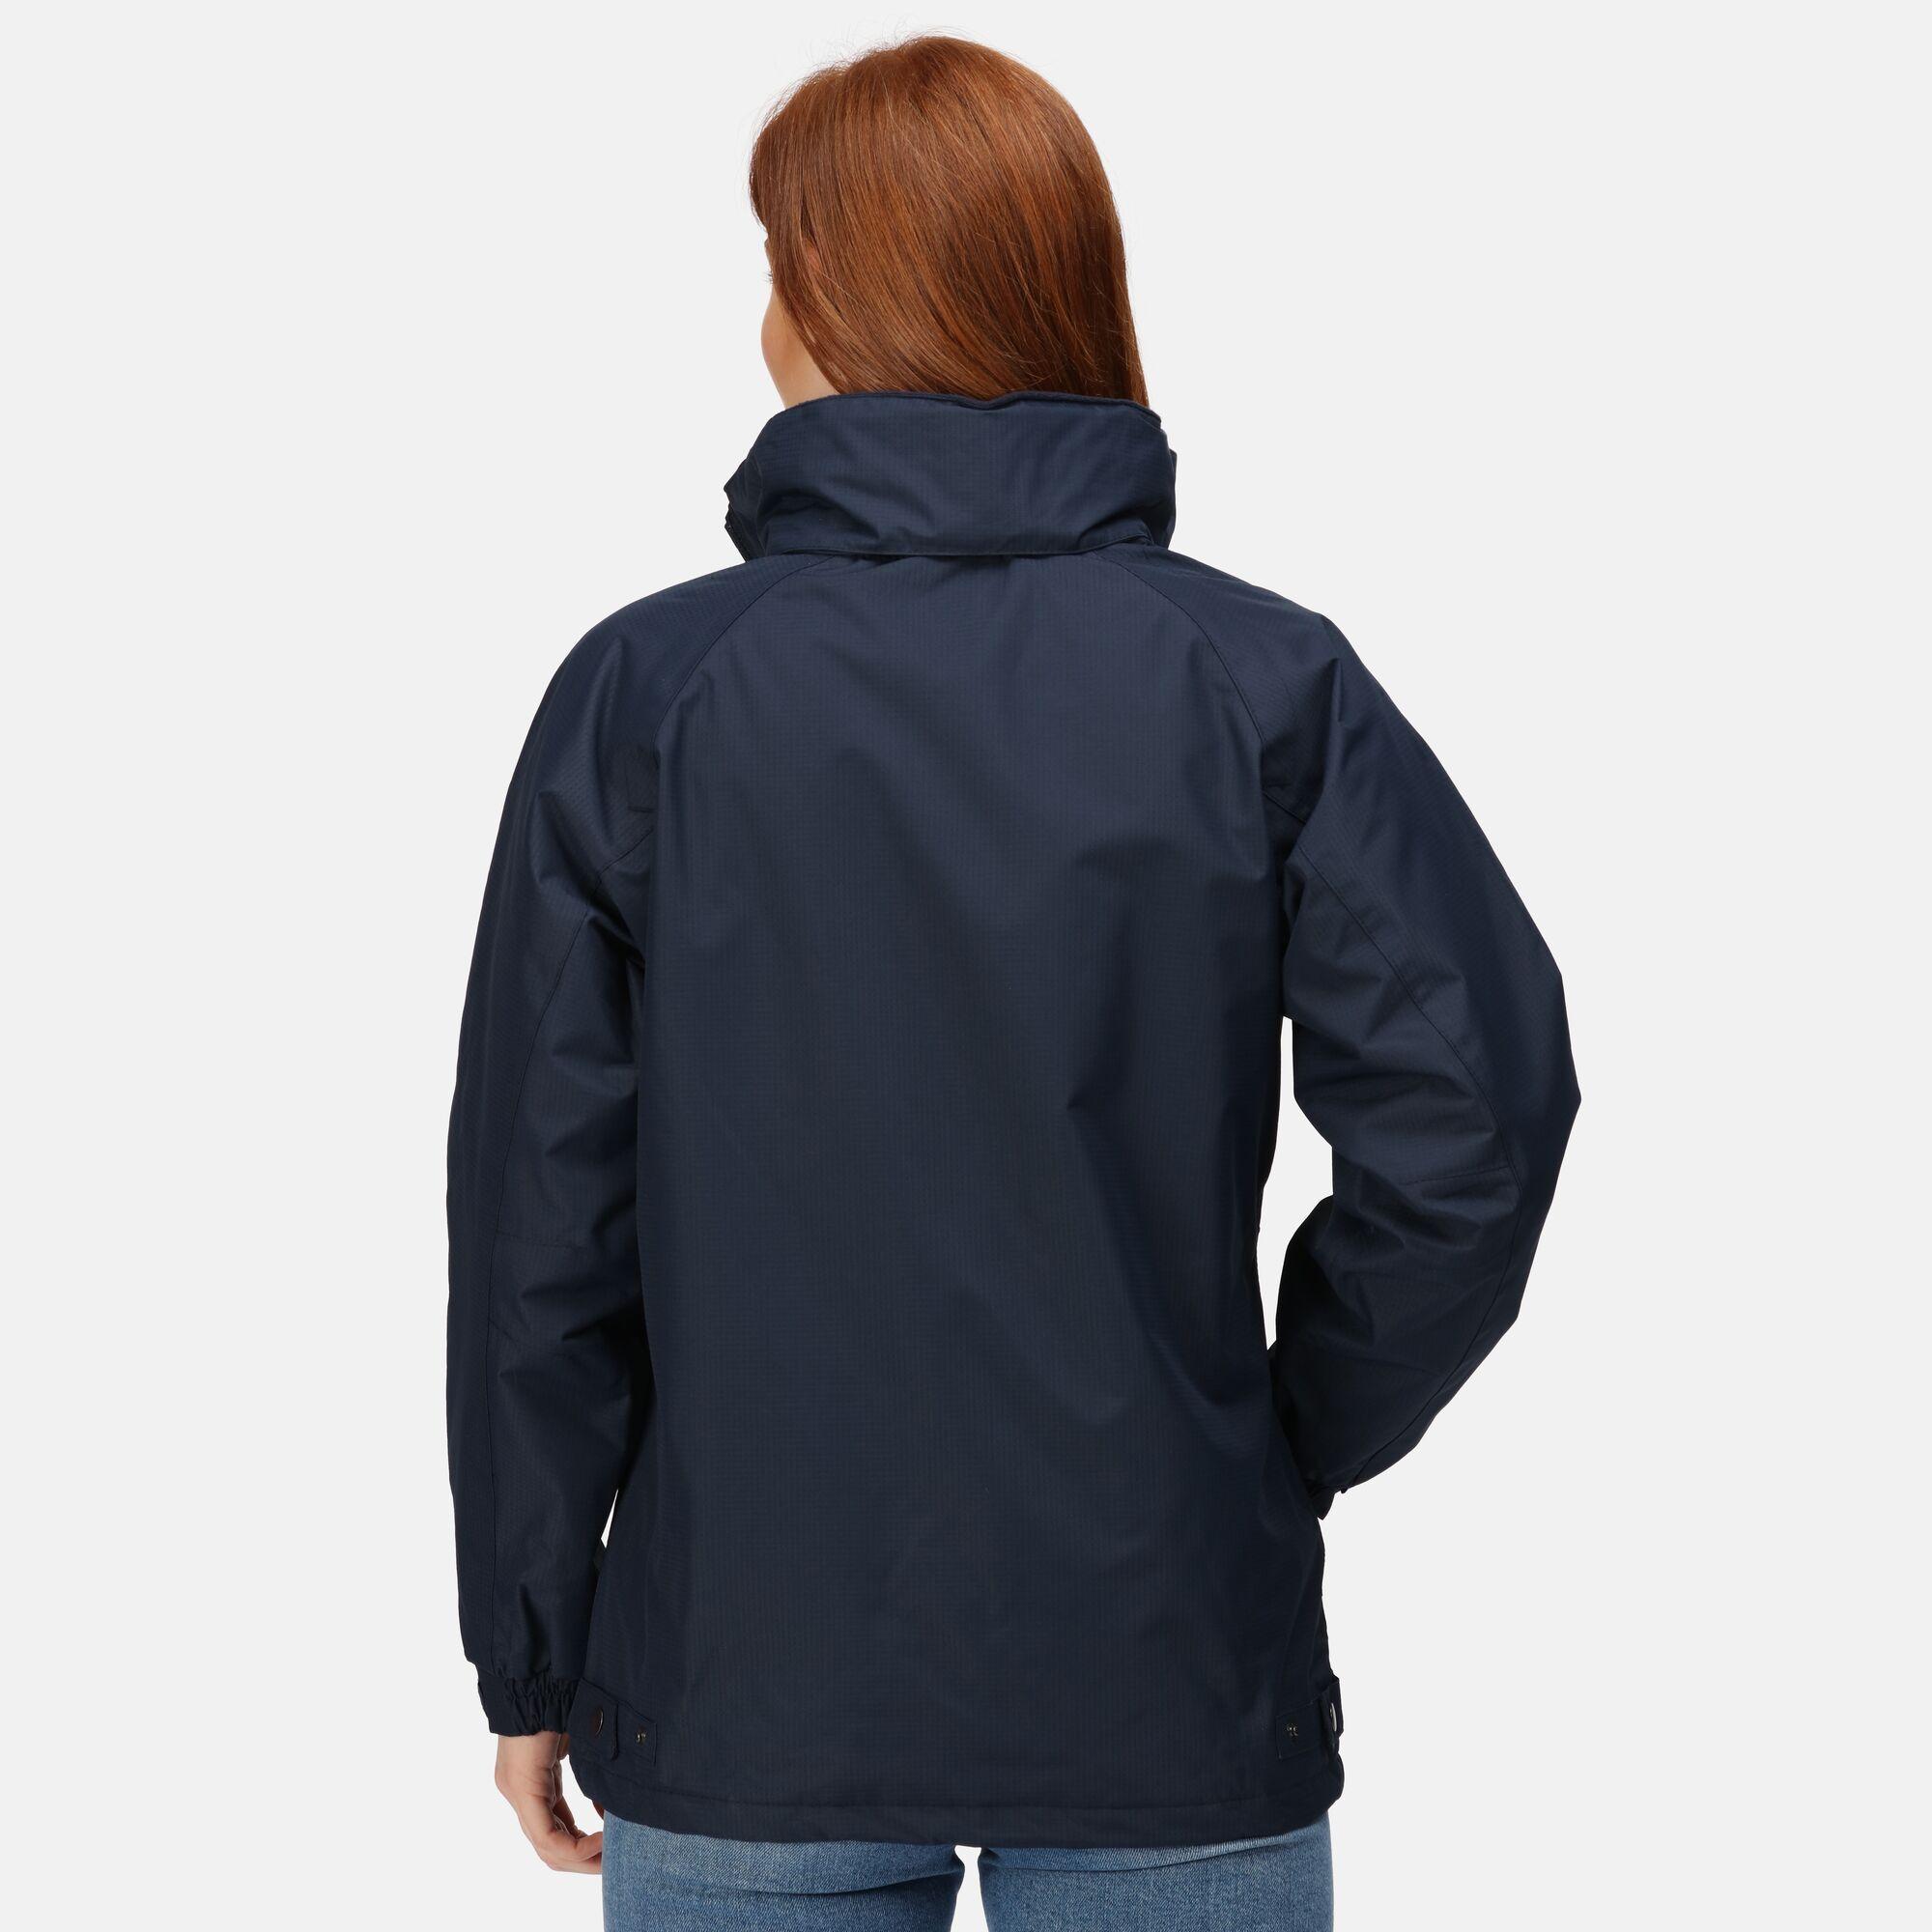 Regatta Womens/Ladies Waterproof Windproof Jacket (Fleece Lined) (14) (Navy)